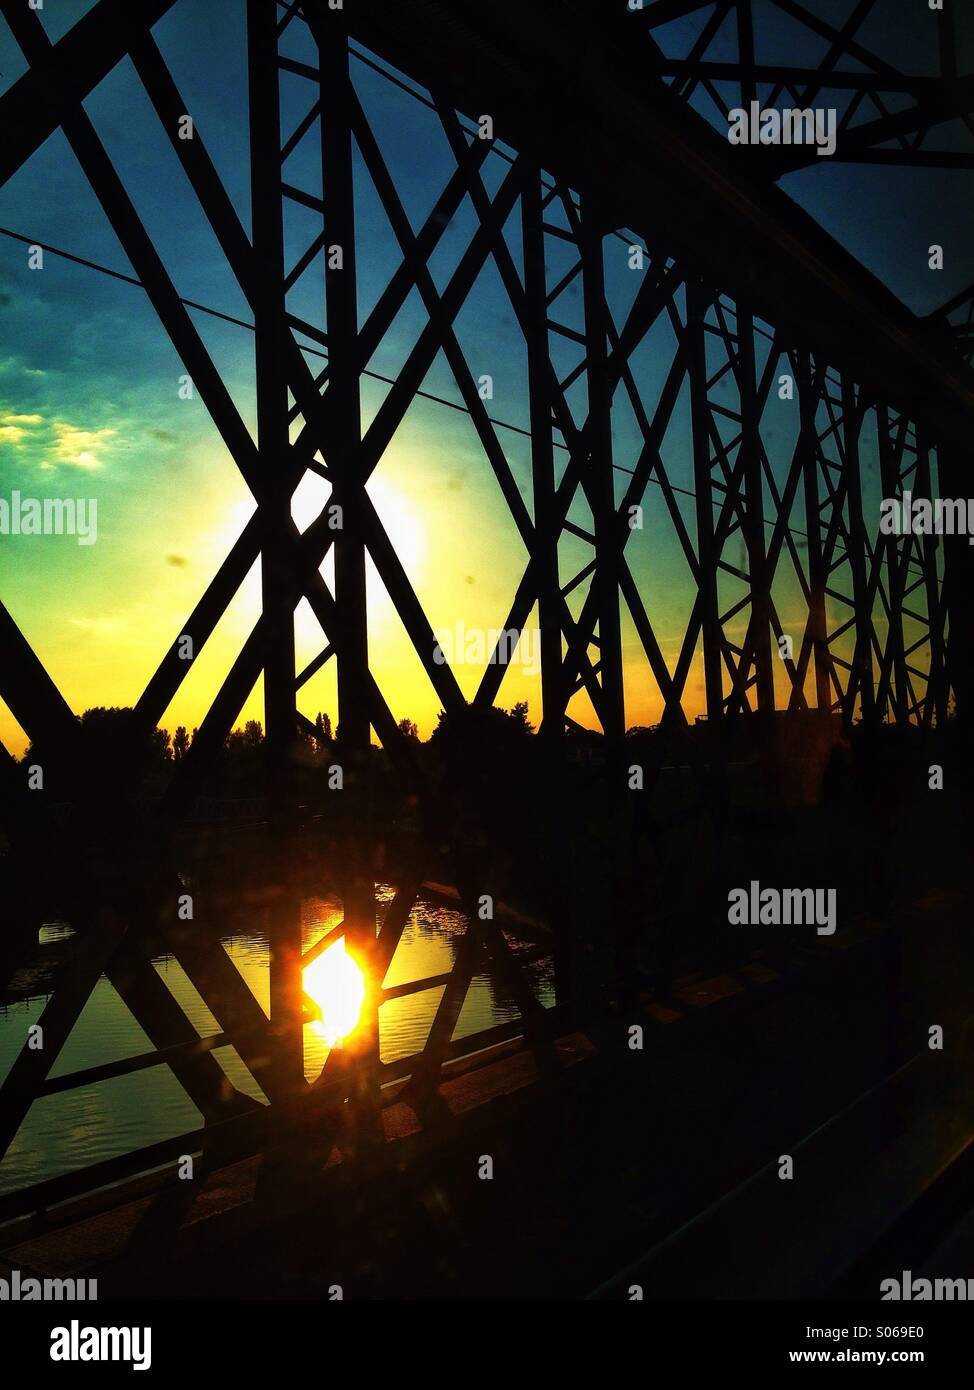 Train bridge sunset - Stock Image